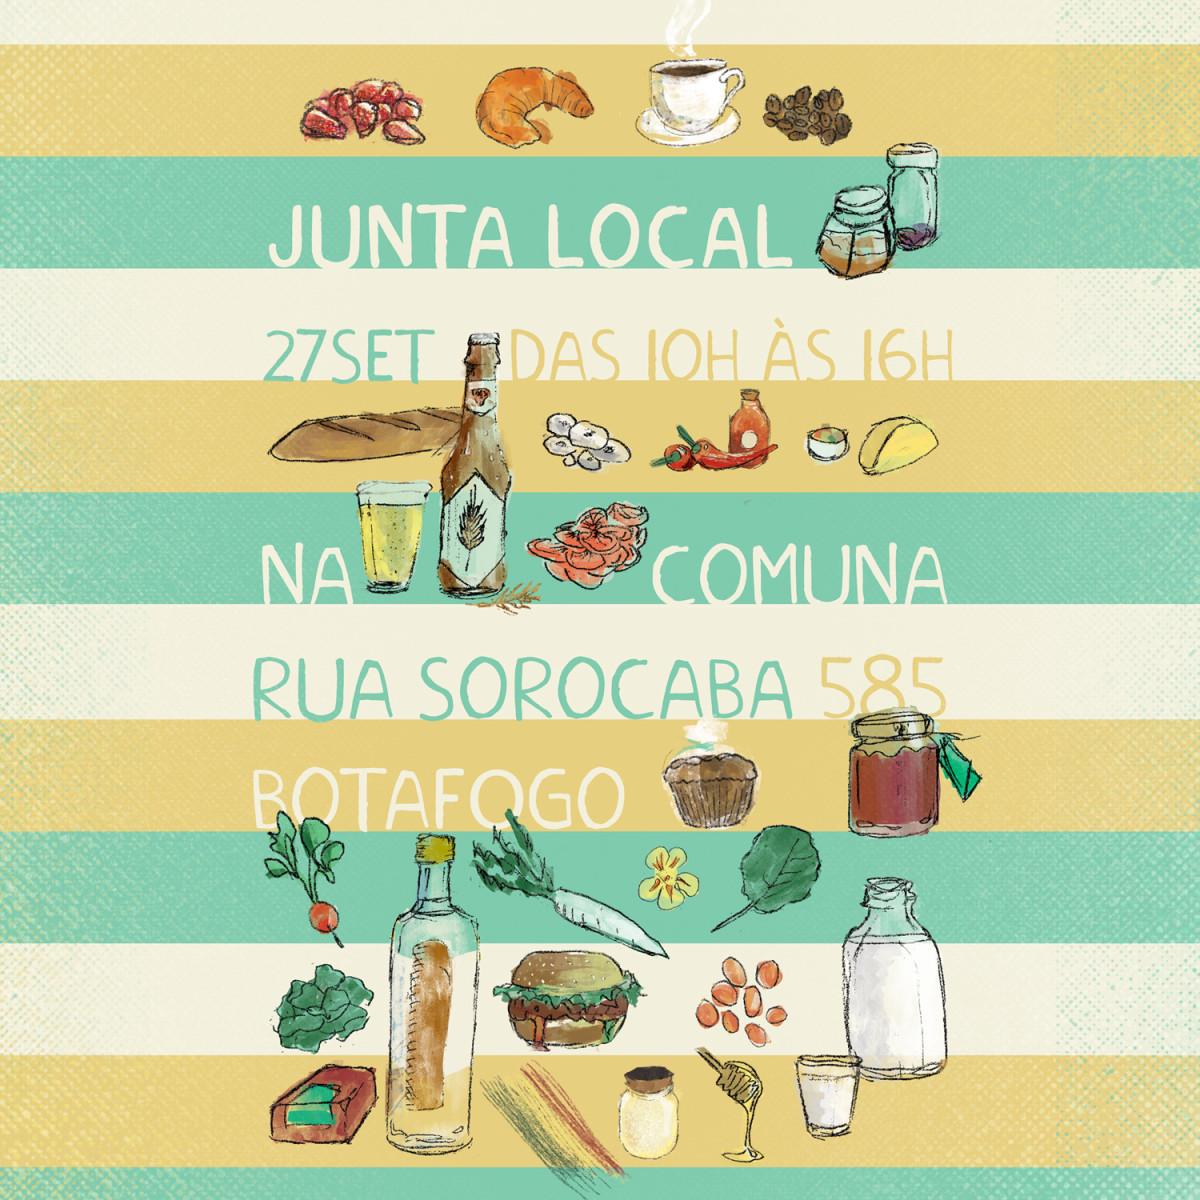 Junta Local # 2